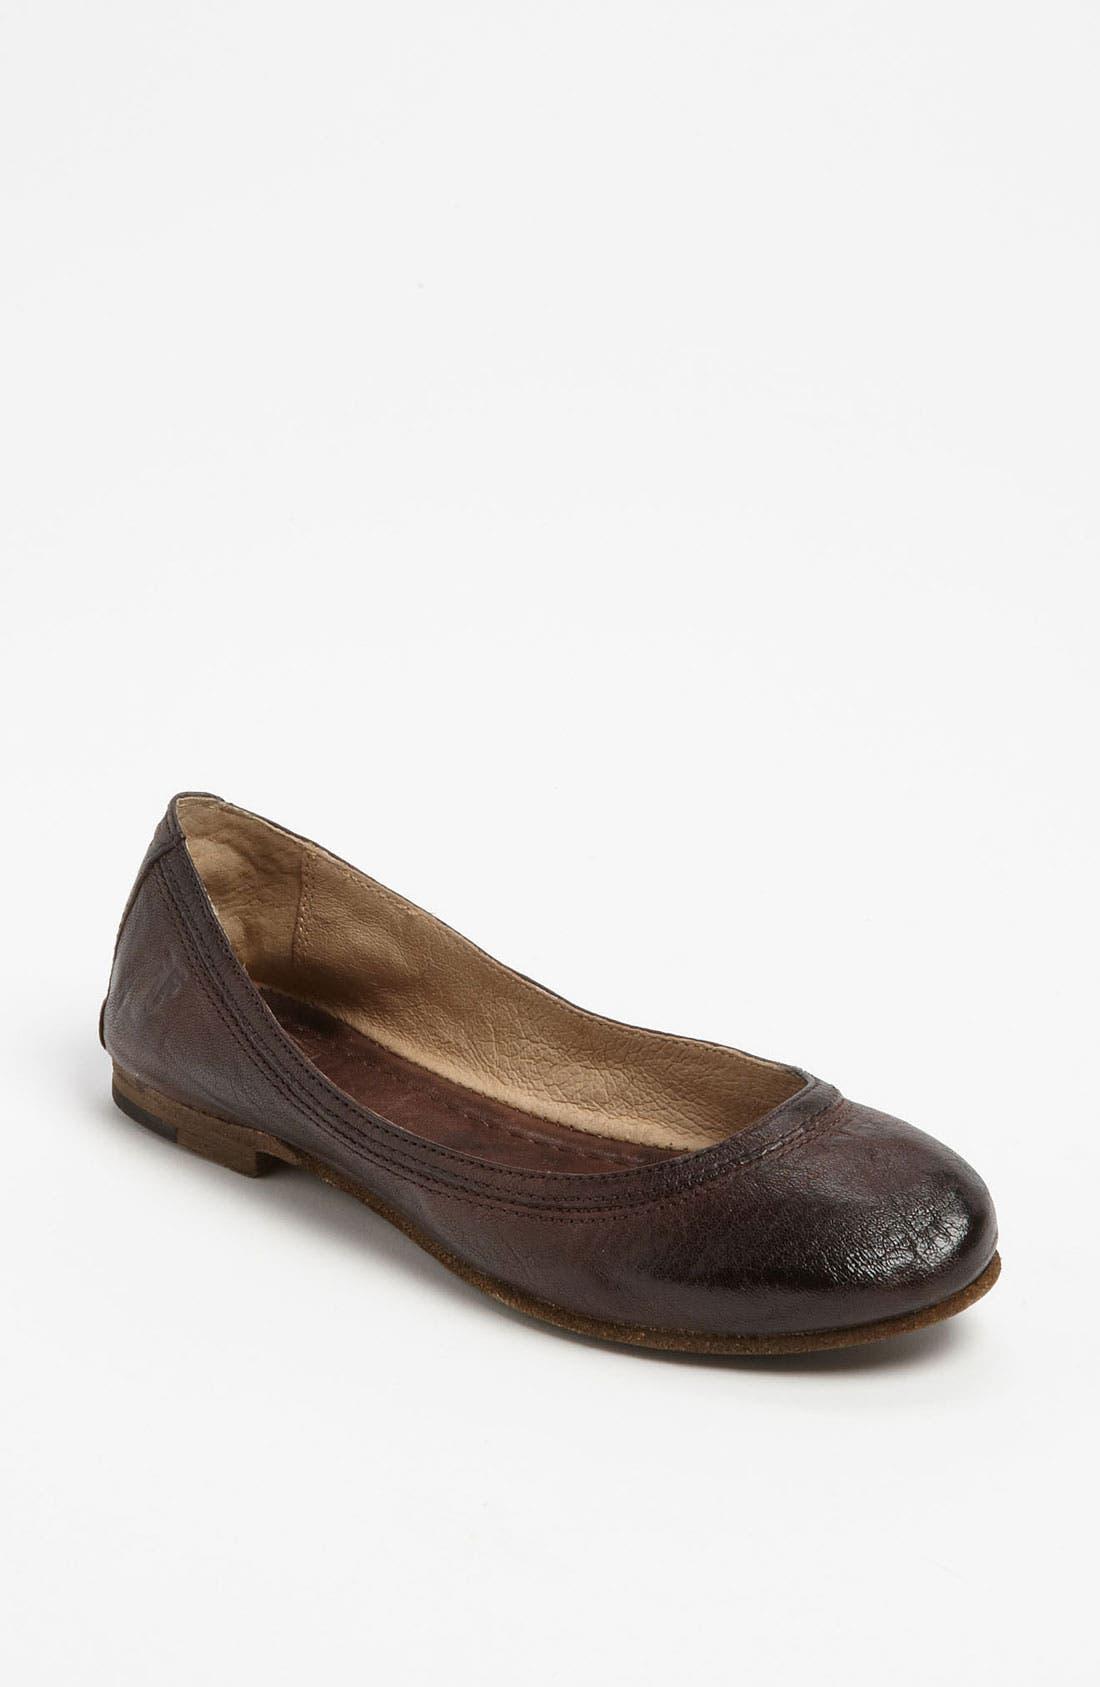 Main Image - Frye 'Carson' Ballet Flat (Women)